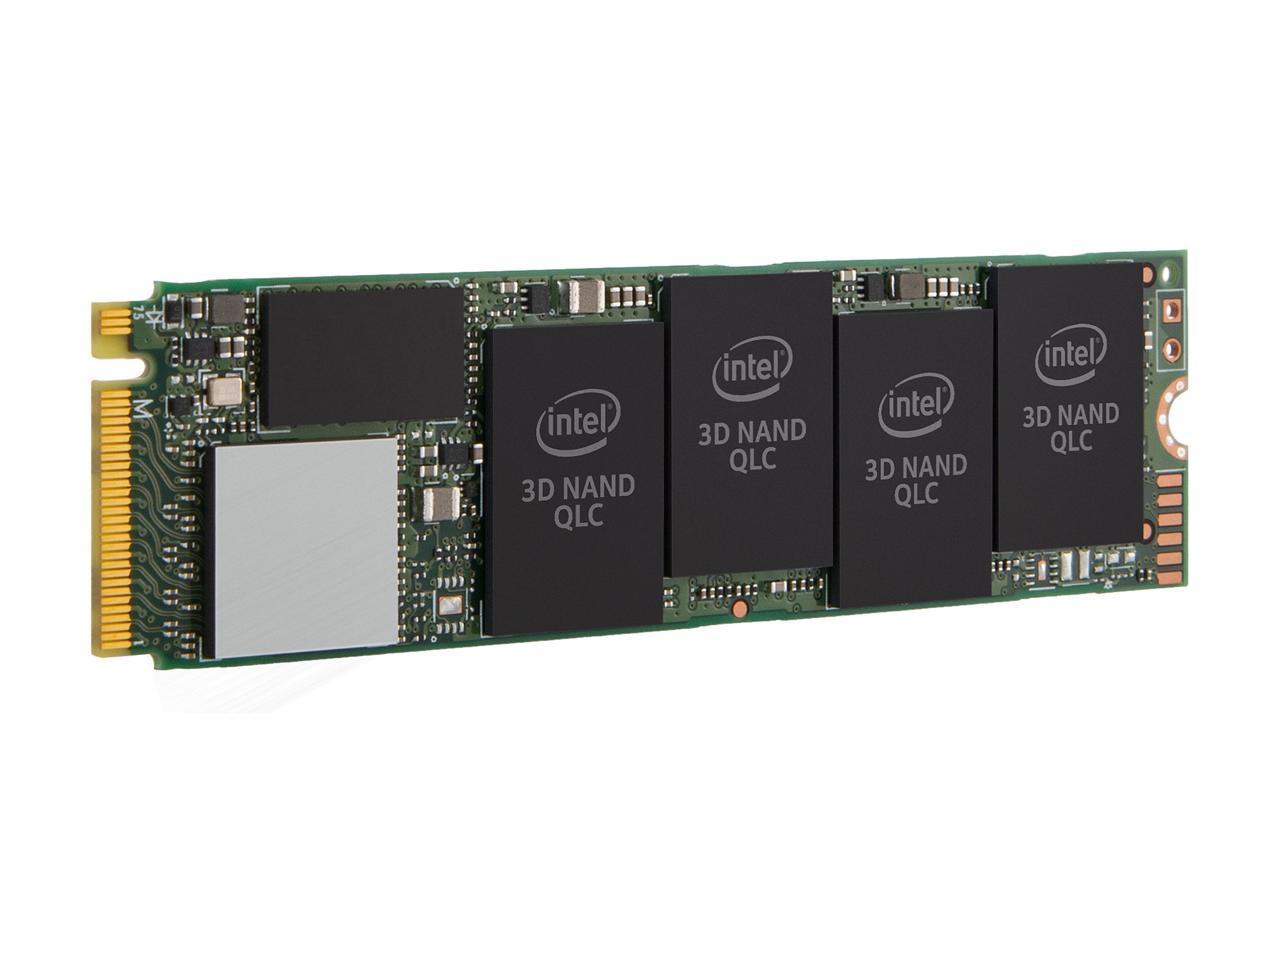 Solid State Drive (SSD) Intel 660P 2 TB NVMe M.2 2280 PCIe 3.0 x4 QLC-3